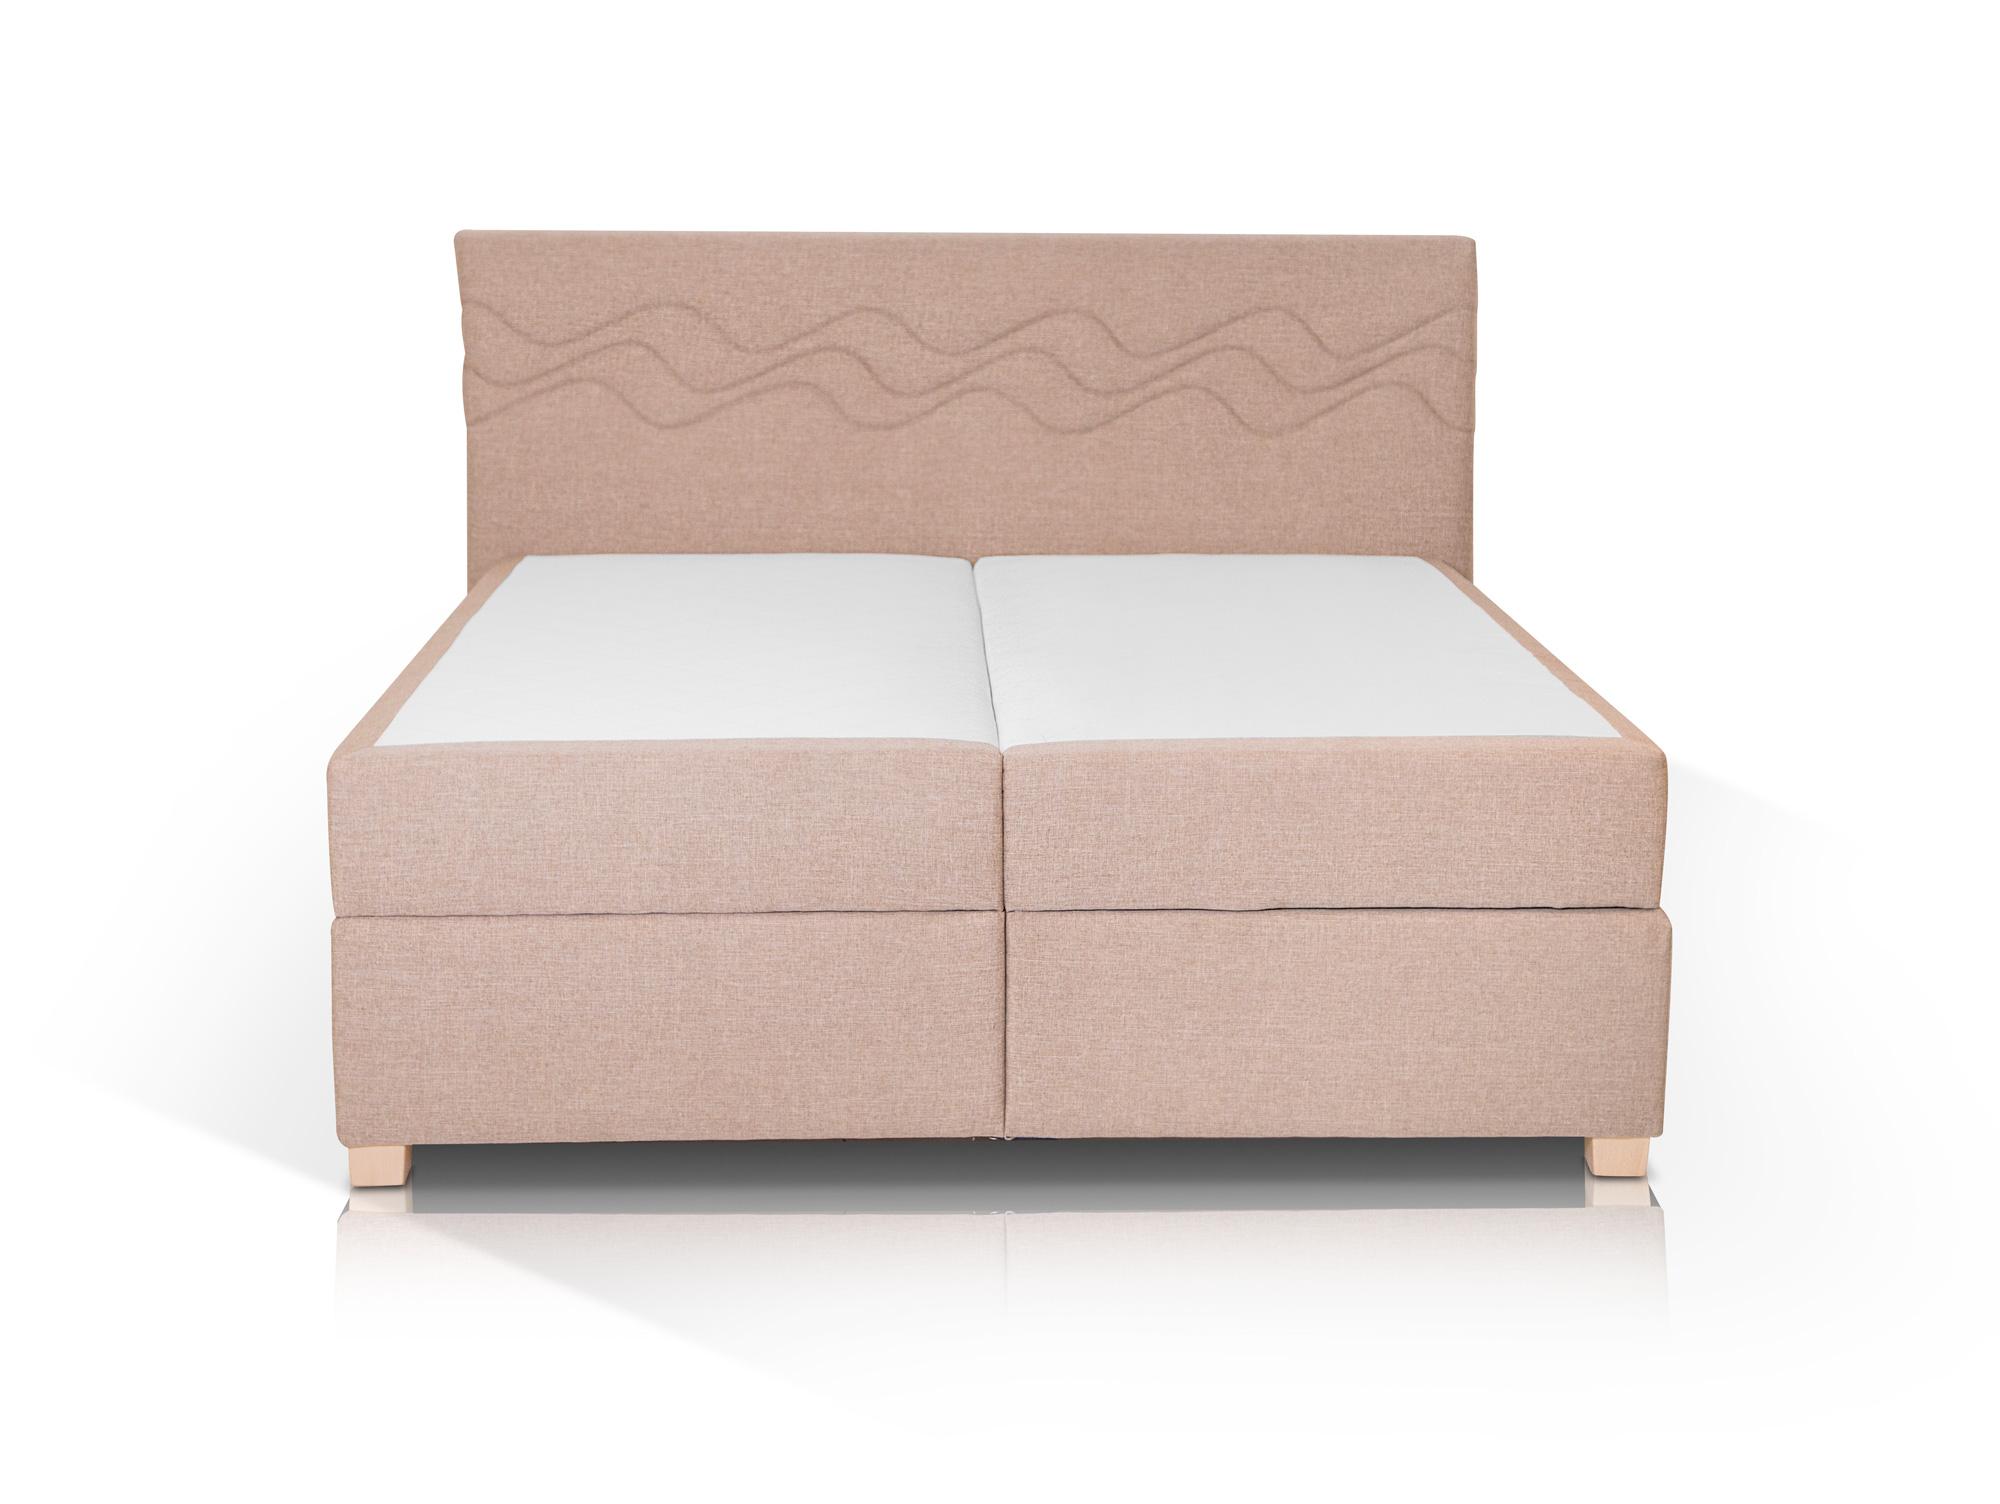 wave boxspringbett mit stoffbezug inklusive bettkasten 200 x 200 cm beige h rtegrad 3. Black Bedroom Furniture Sets. Home Design Ideas